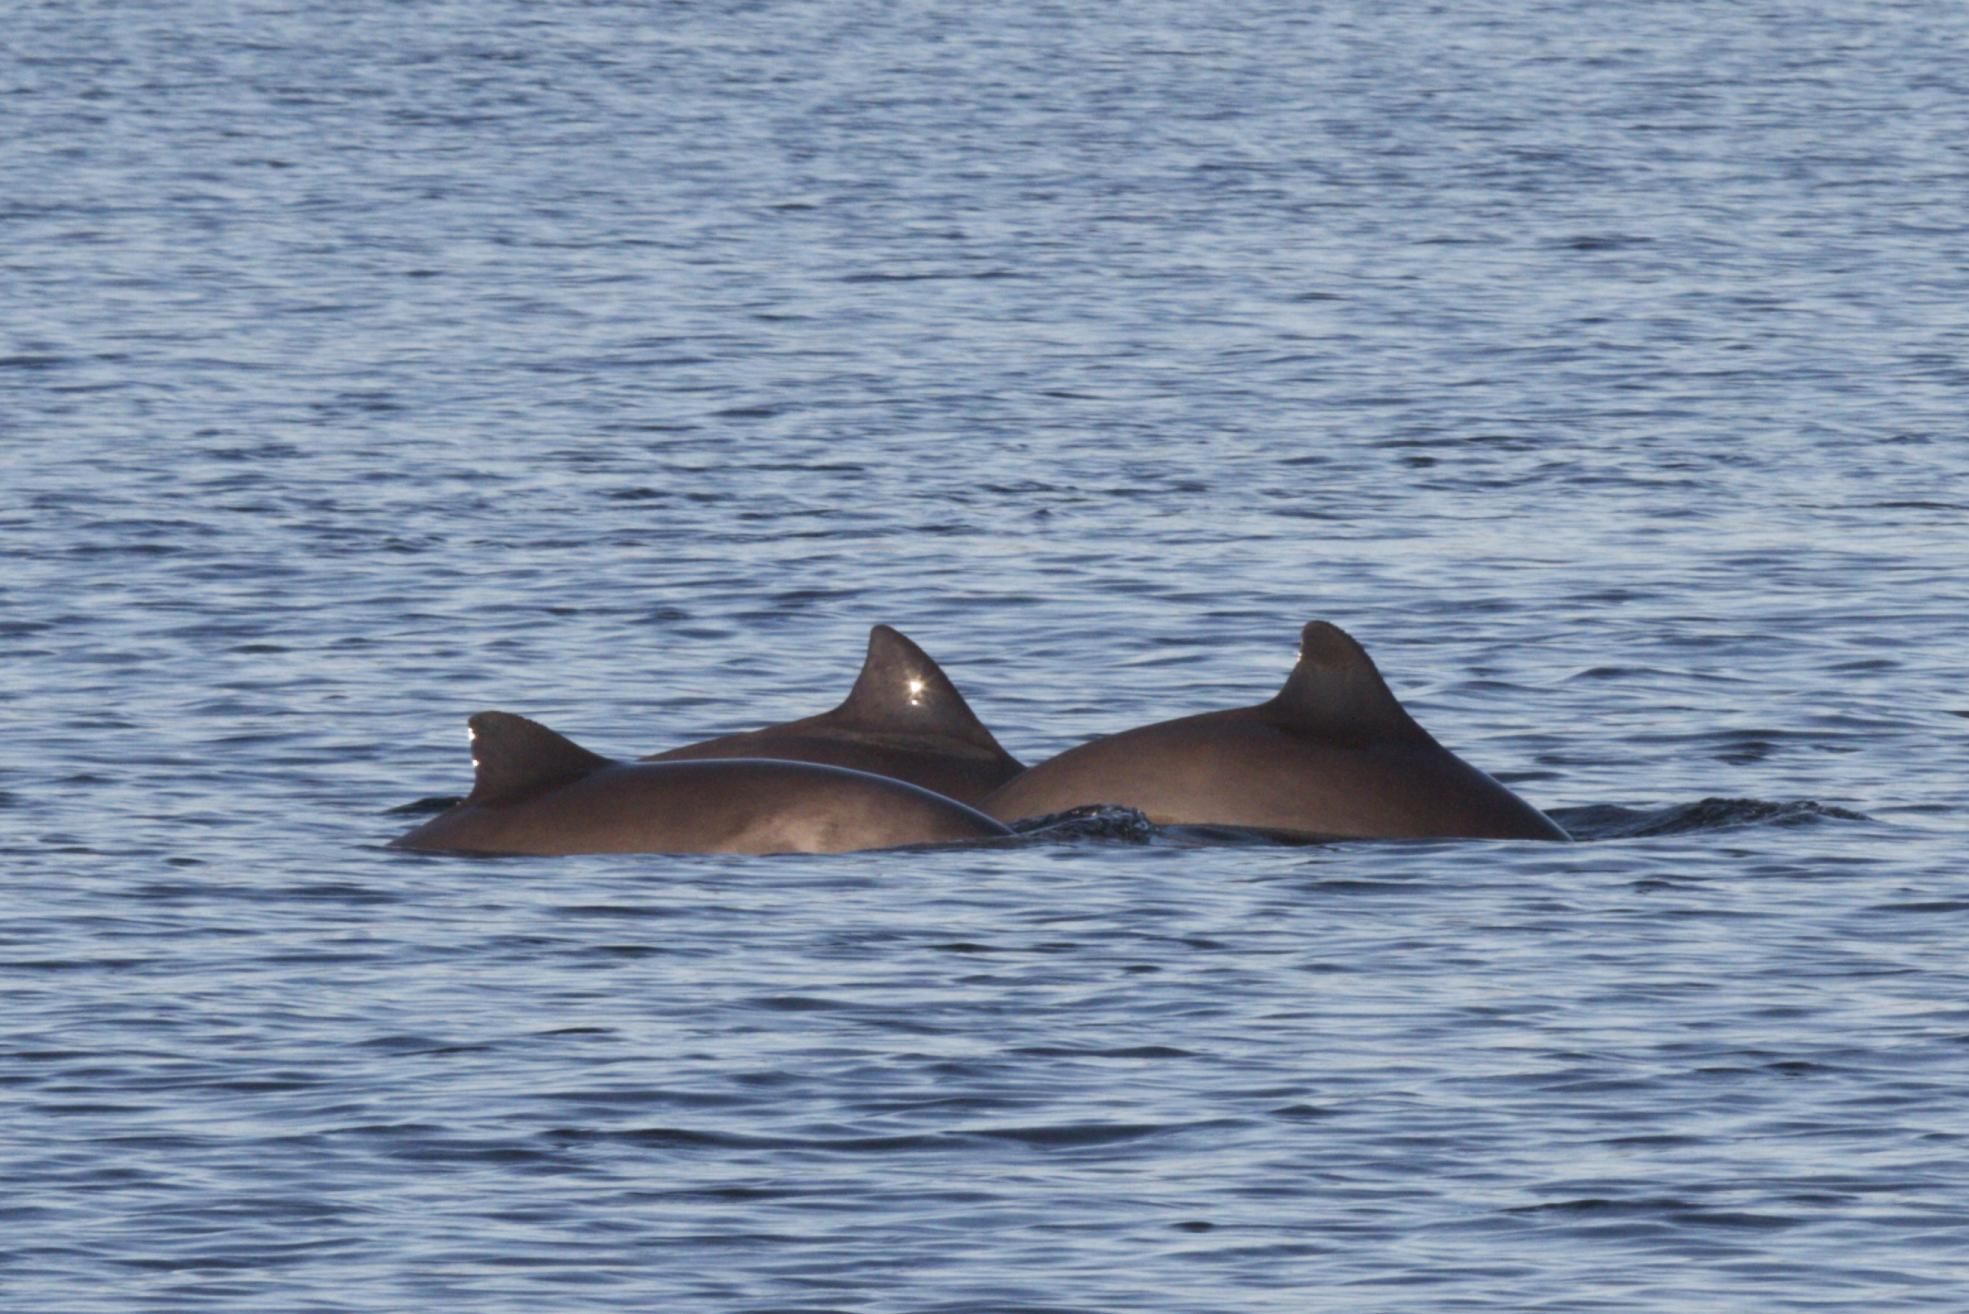 A sense of porpoise | Blue Planet Society